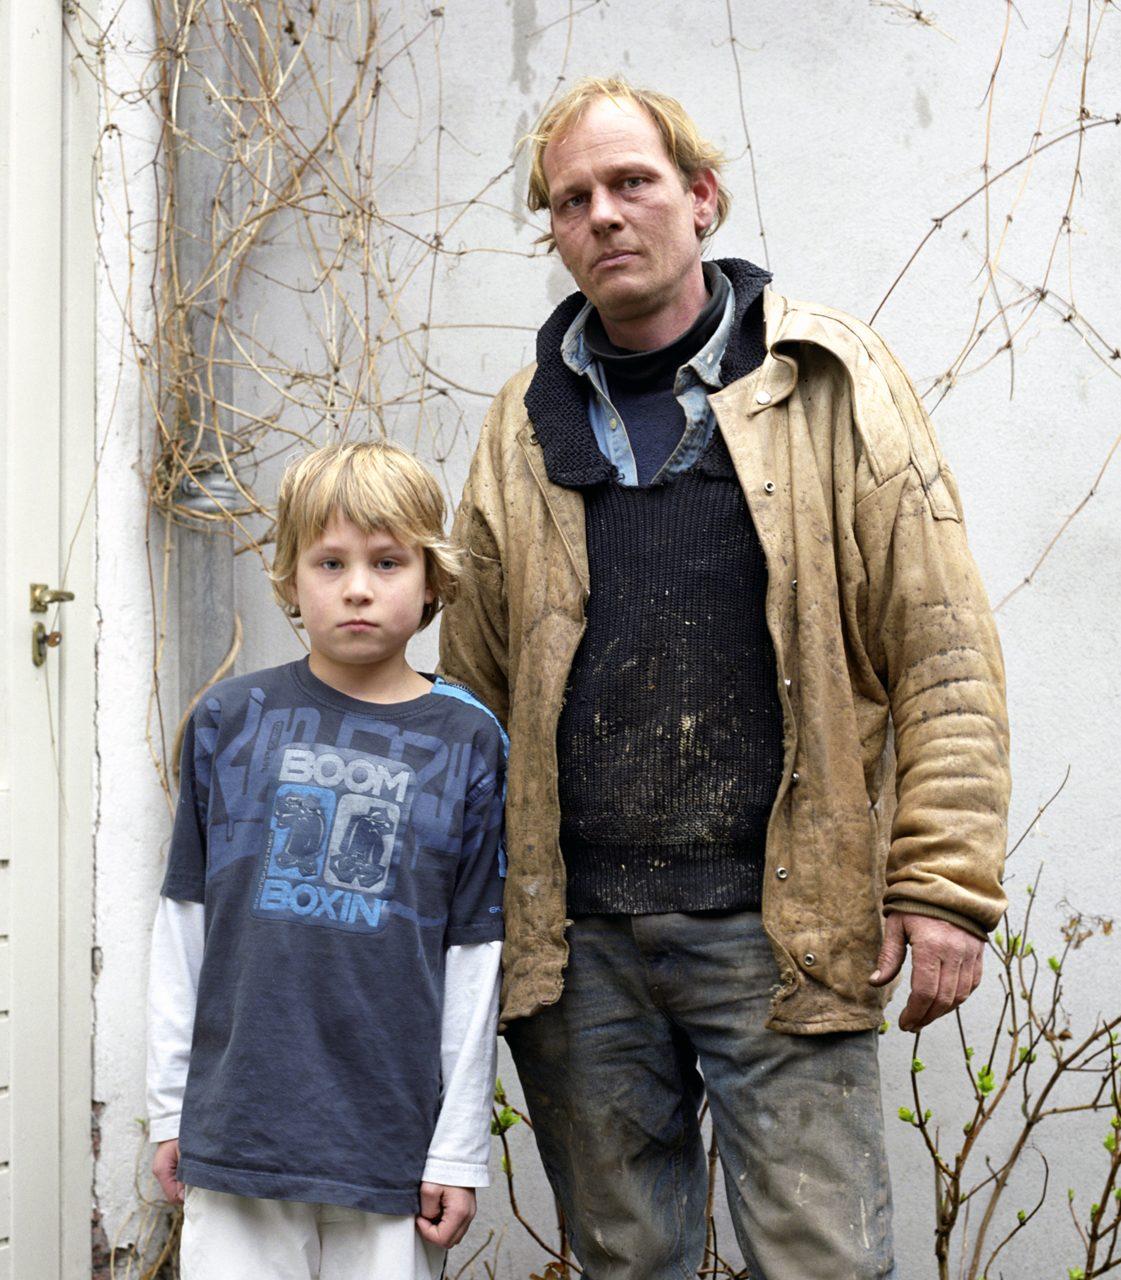 Freek Slot and his son, Groot BV, Edam, 2007